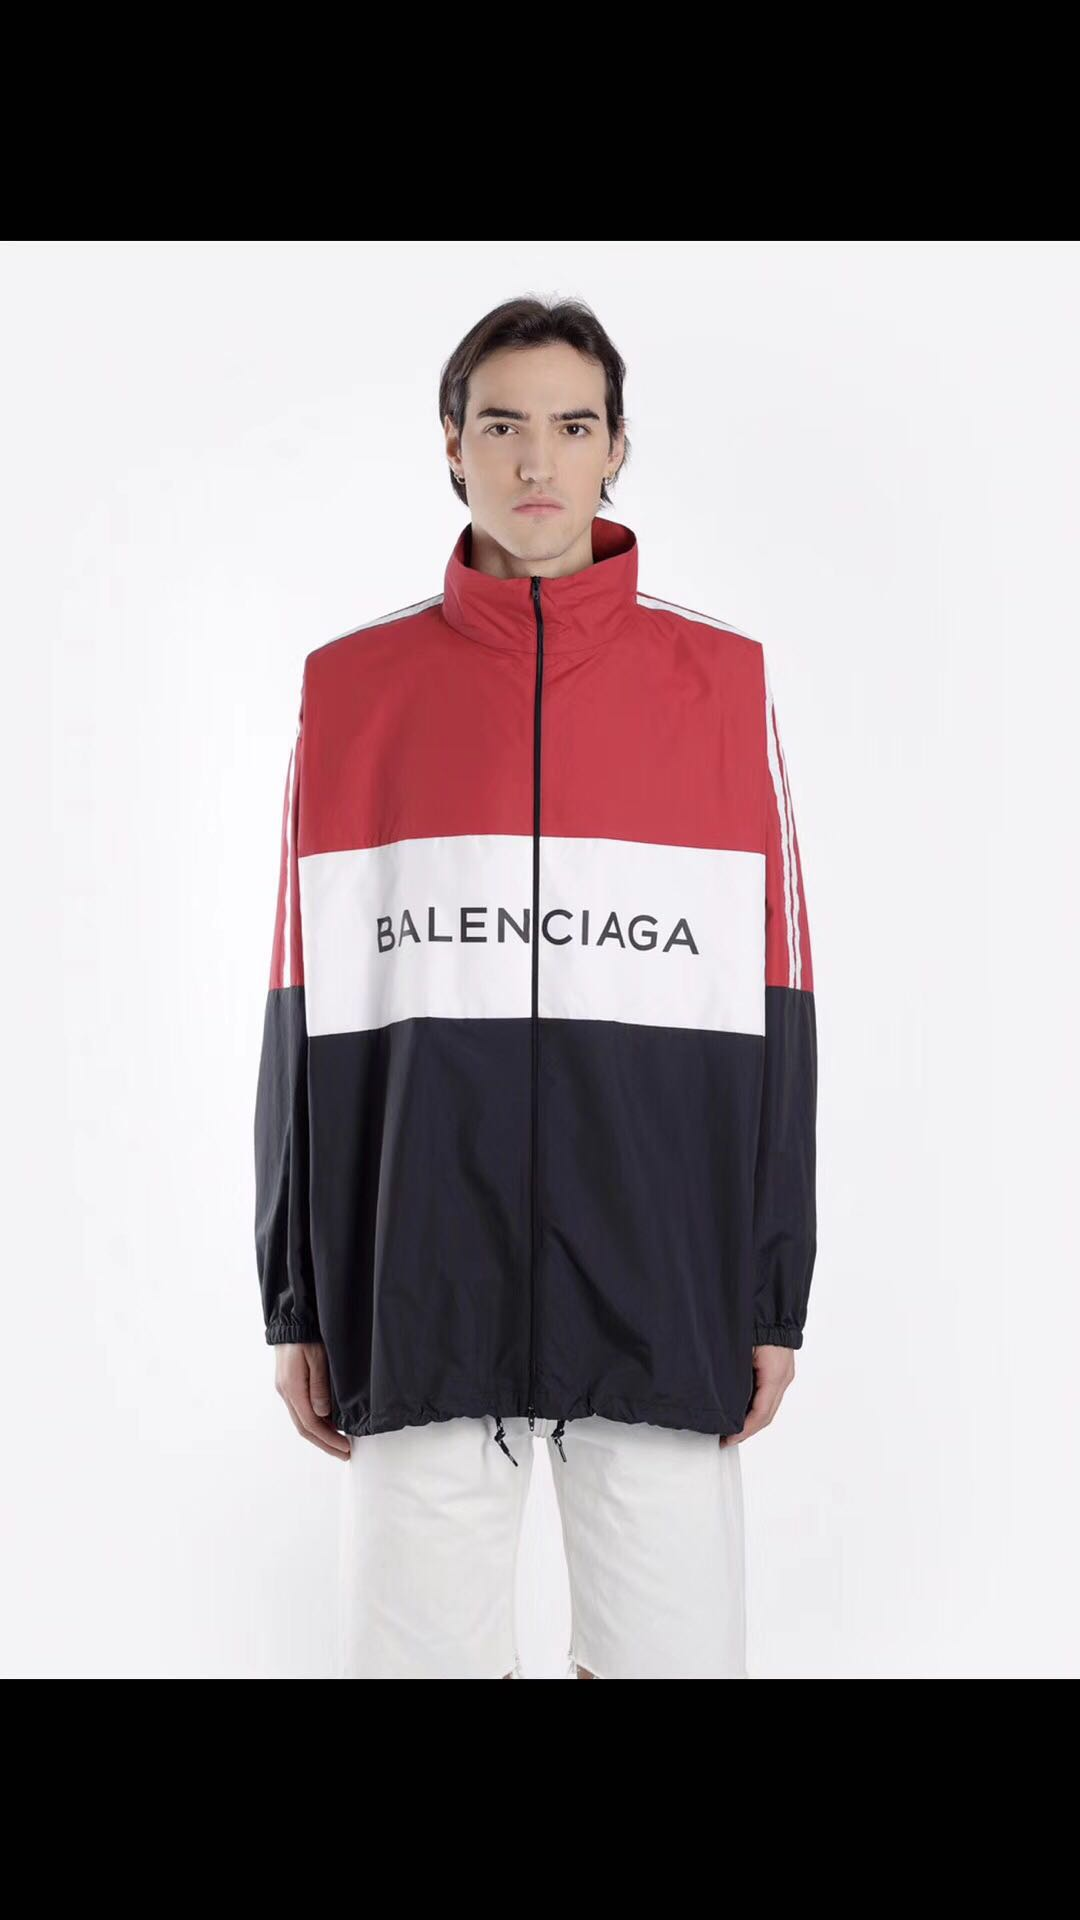 BALENCIAGA 18SS TRACKSUIT Poplin Shirt